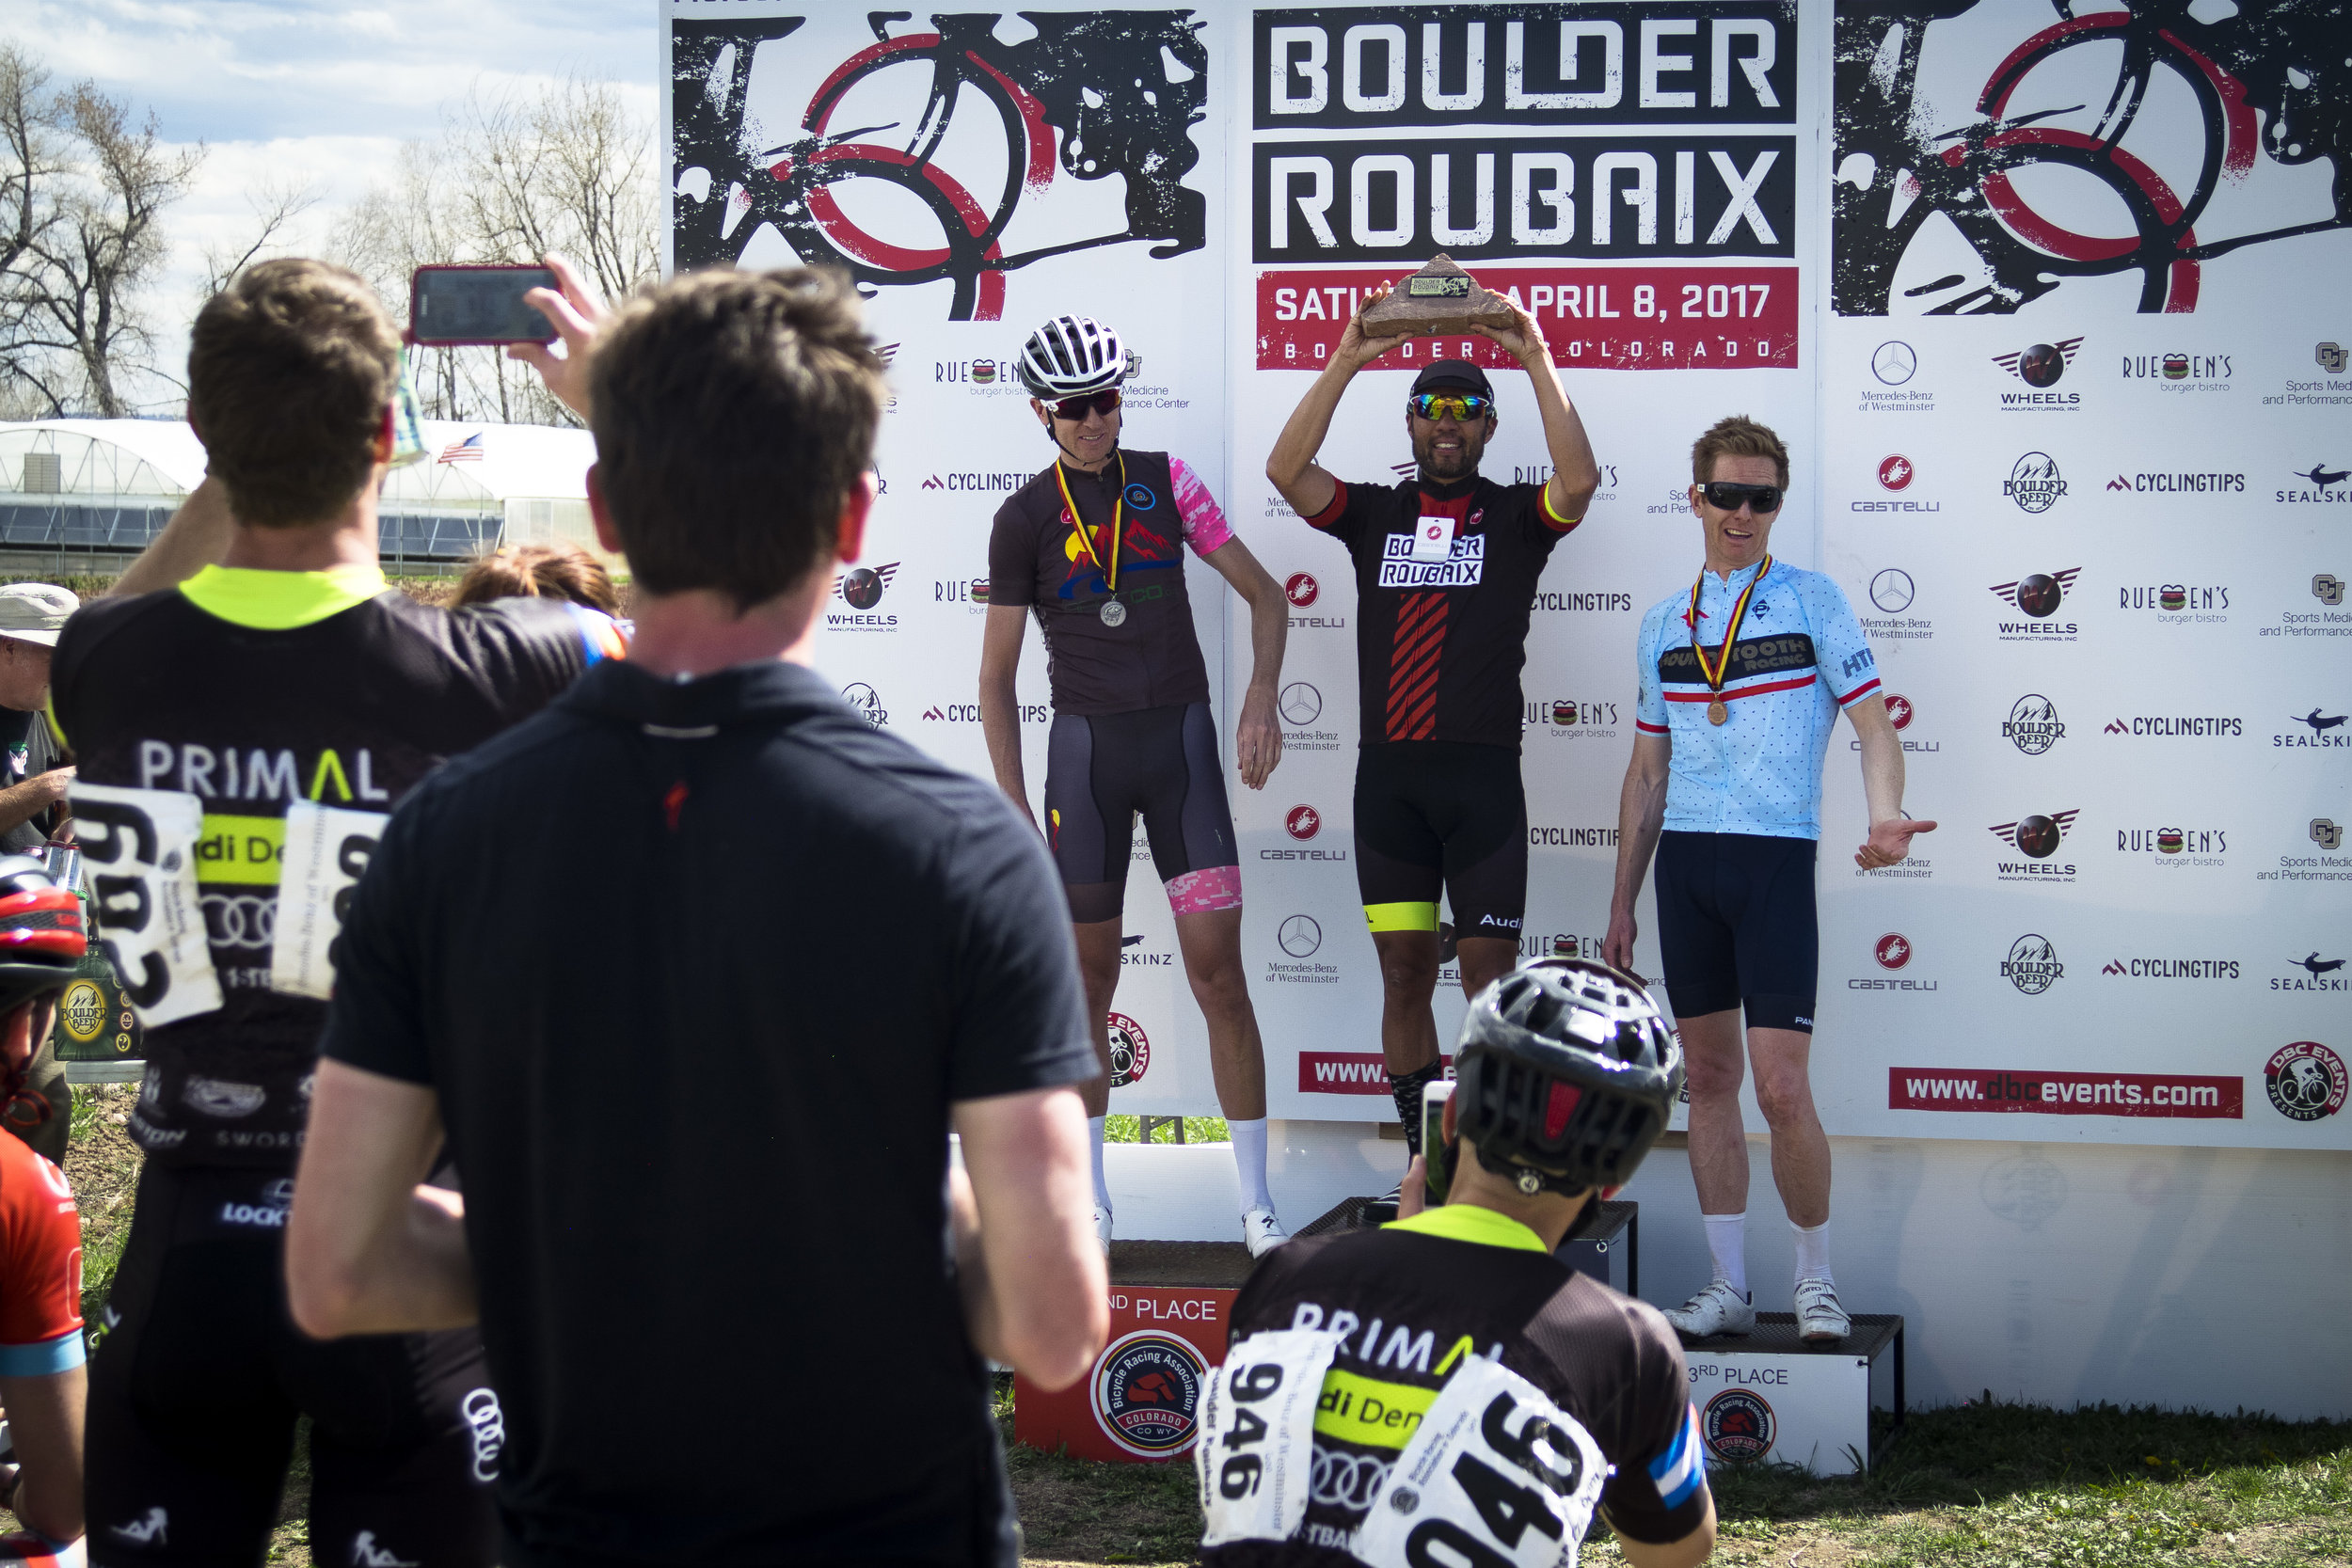 podium9.JPG